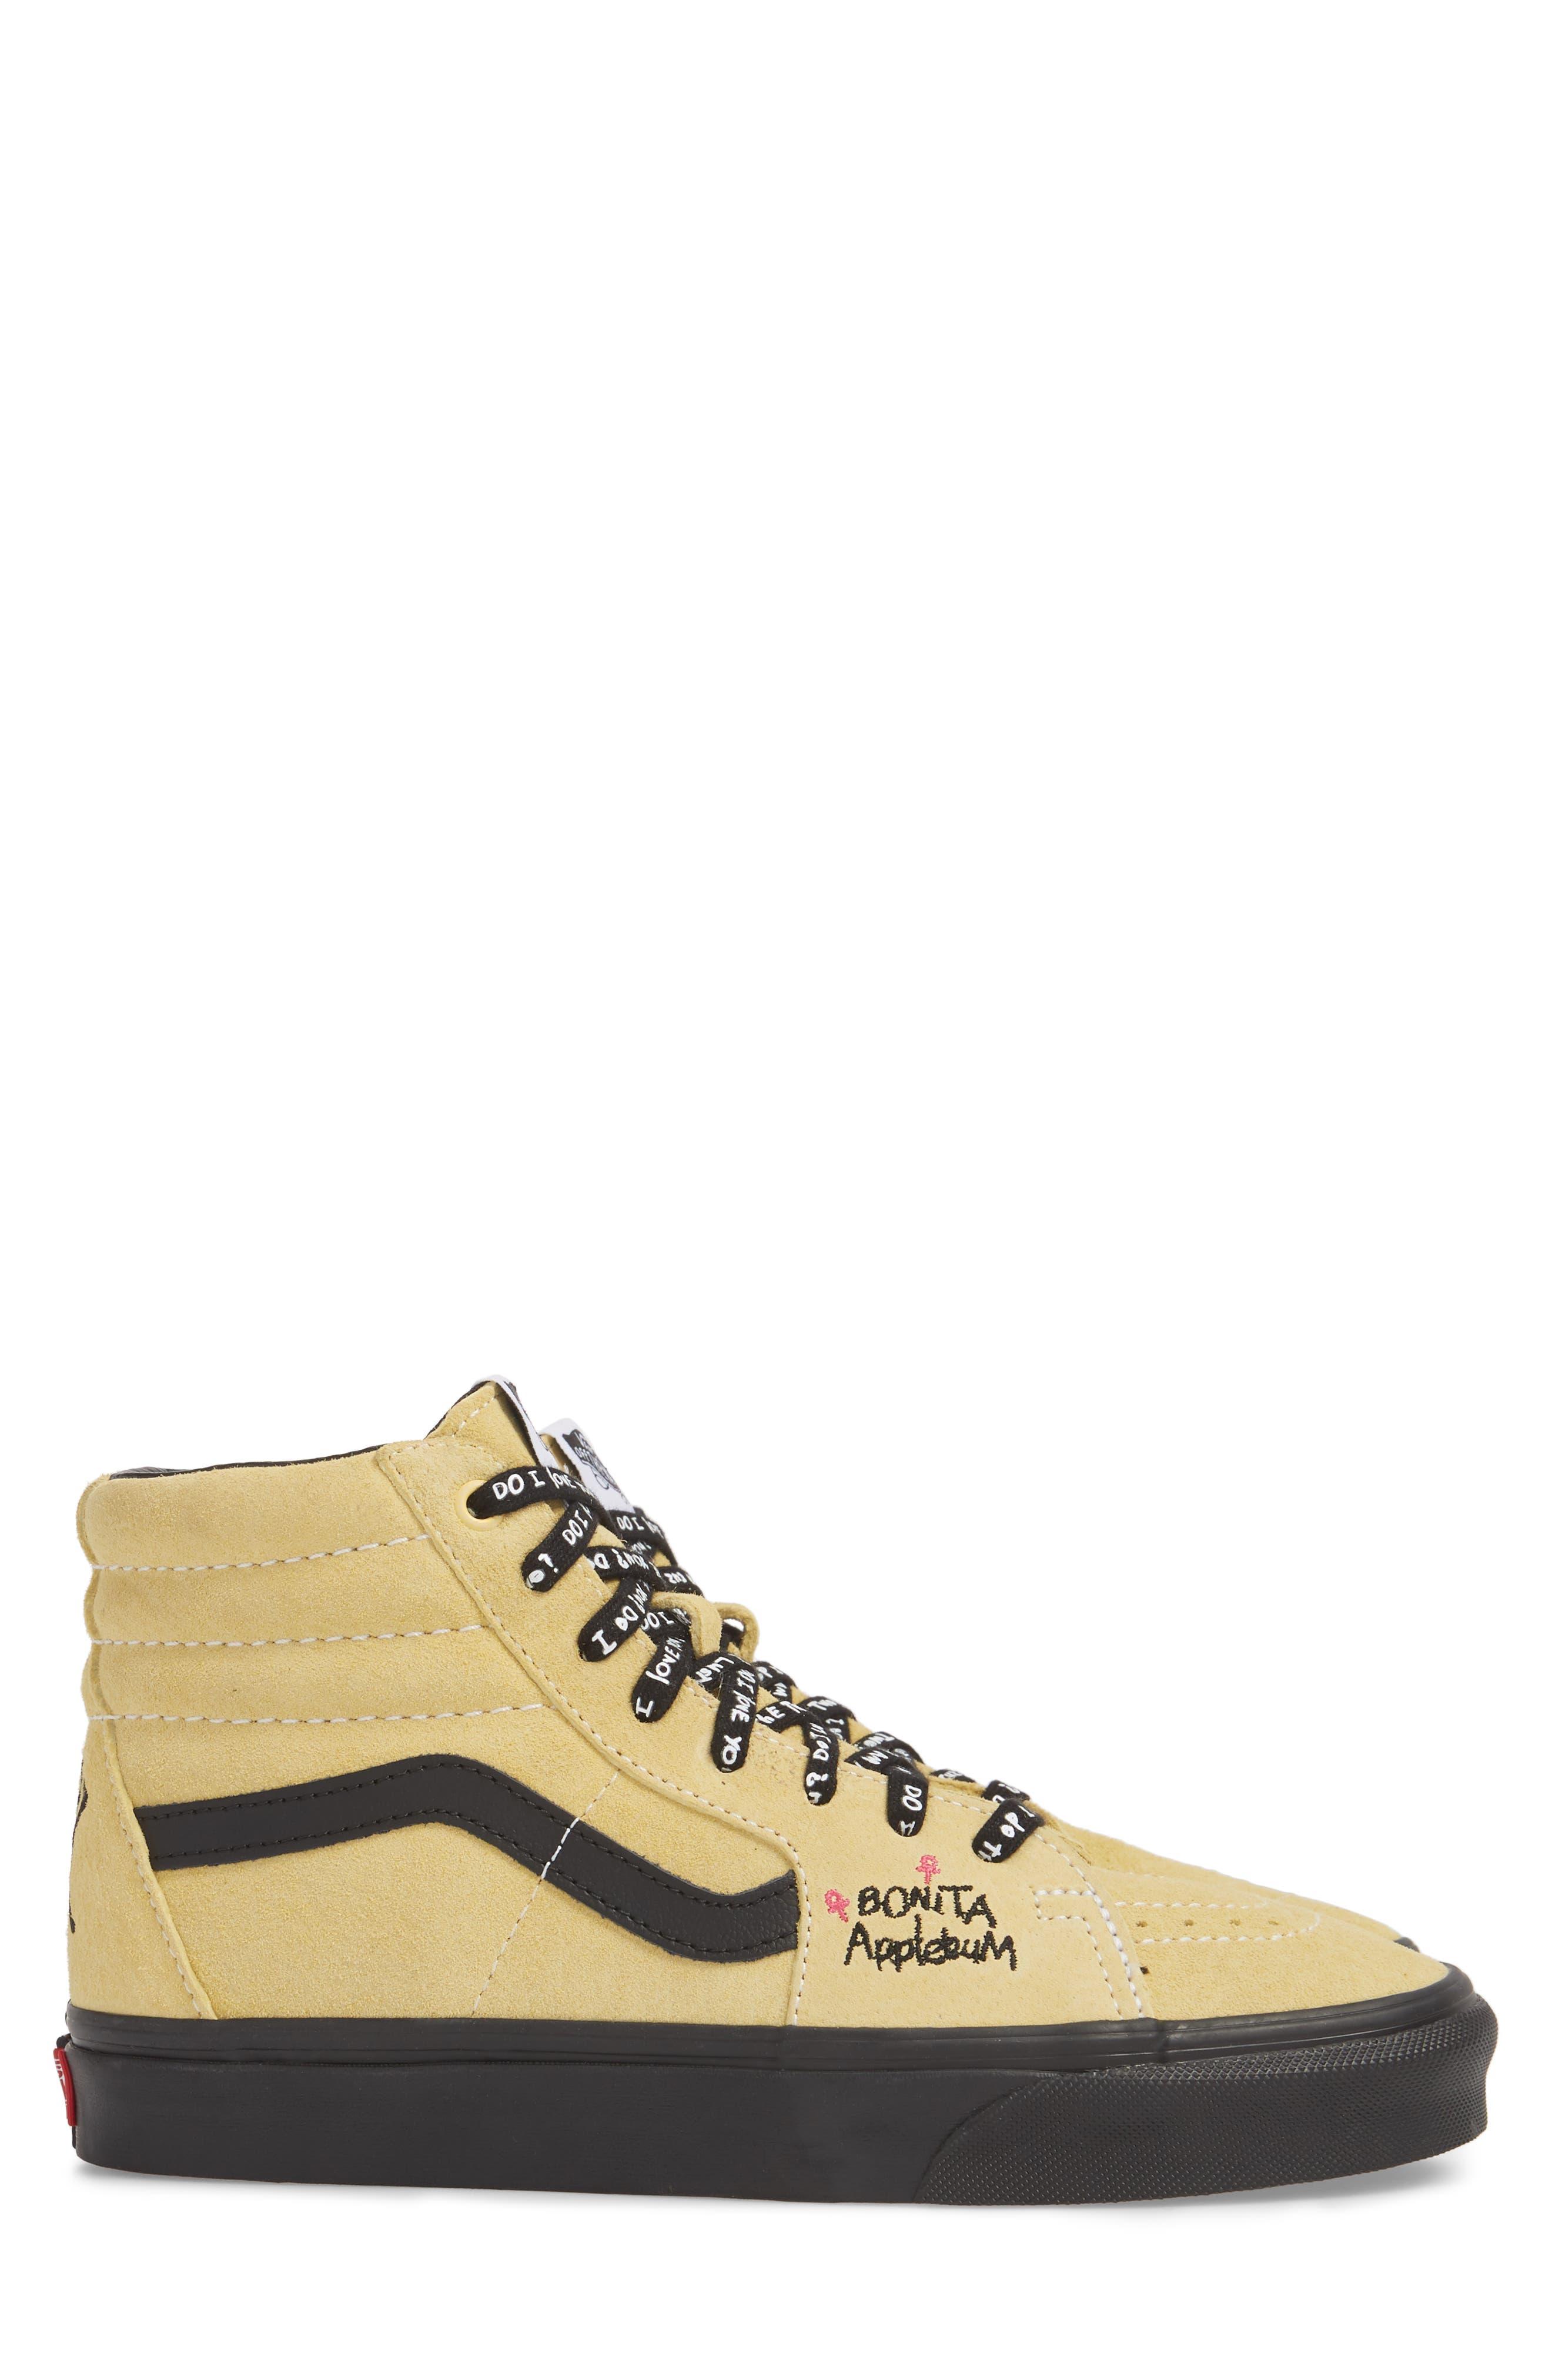 ATCQ Sk8-Hi Sneaker,                             Alternate thumbnail 4, color,                             720